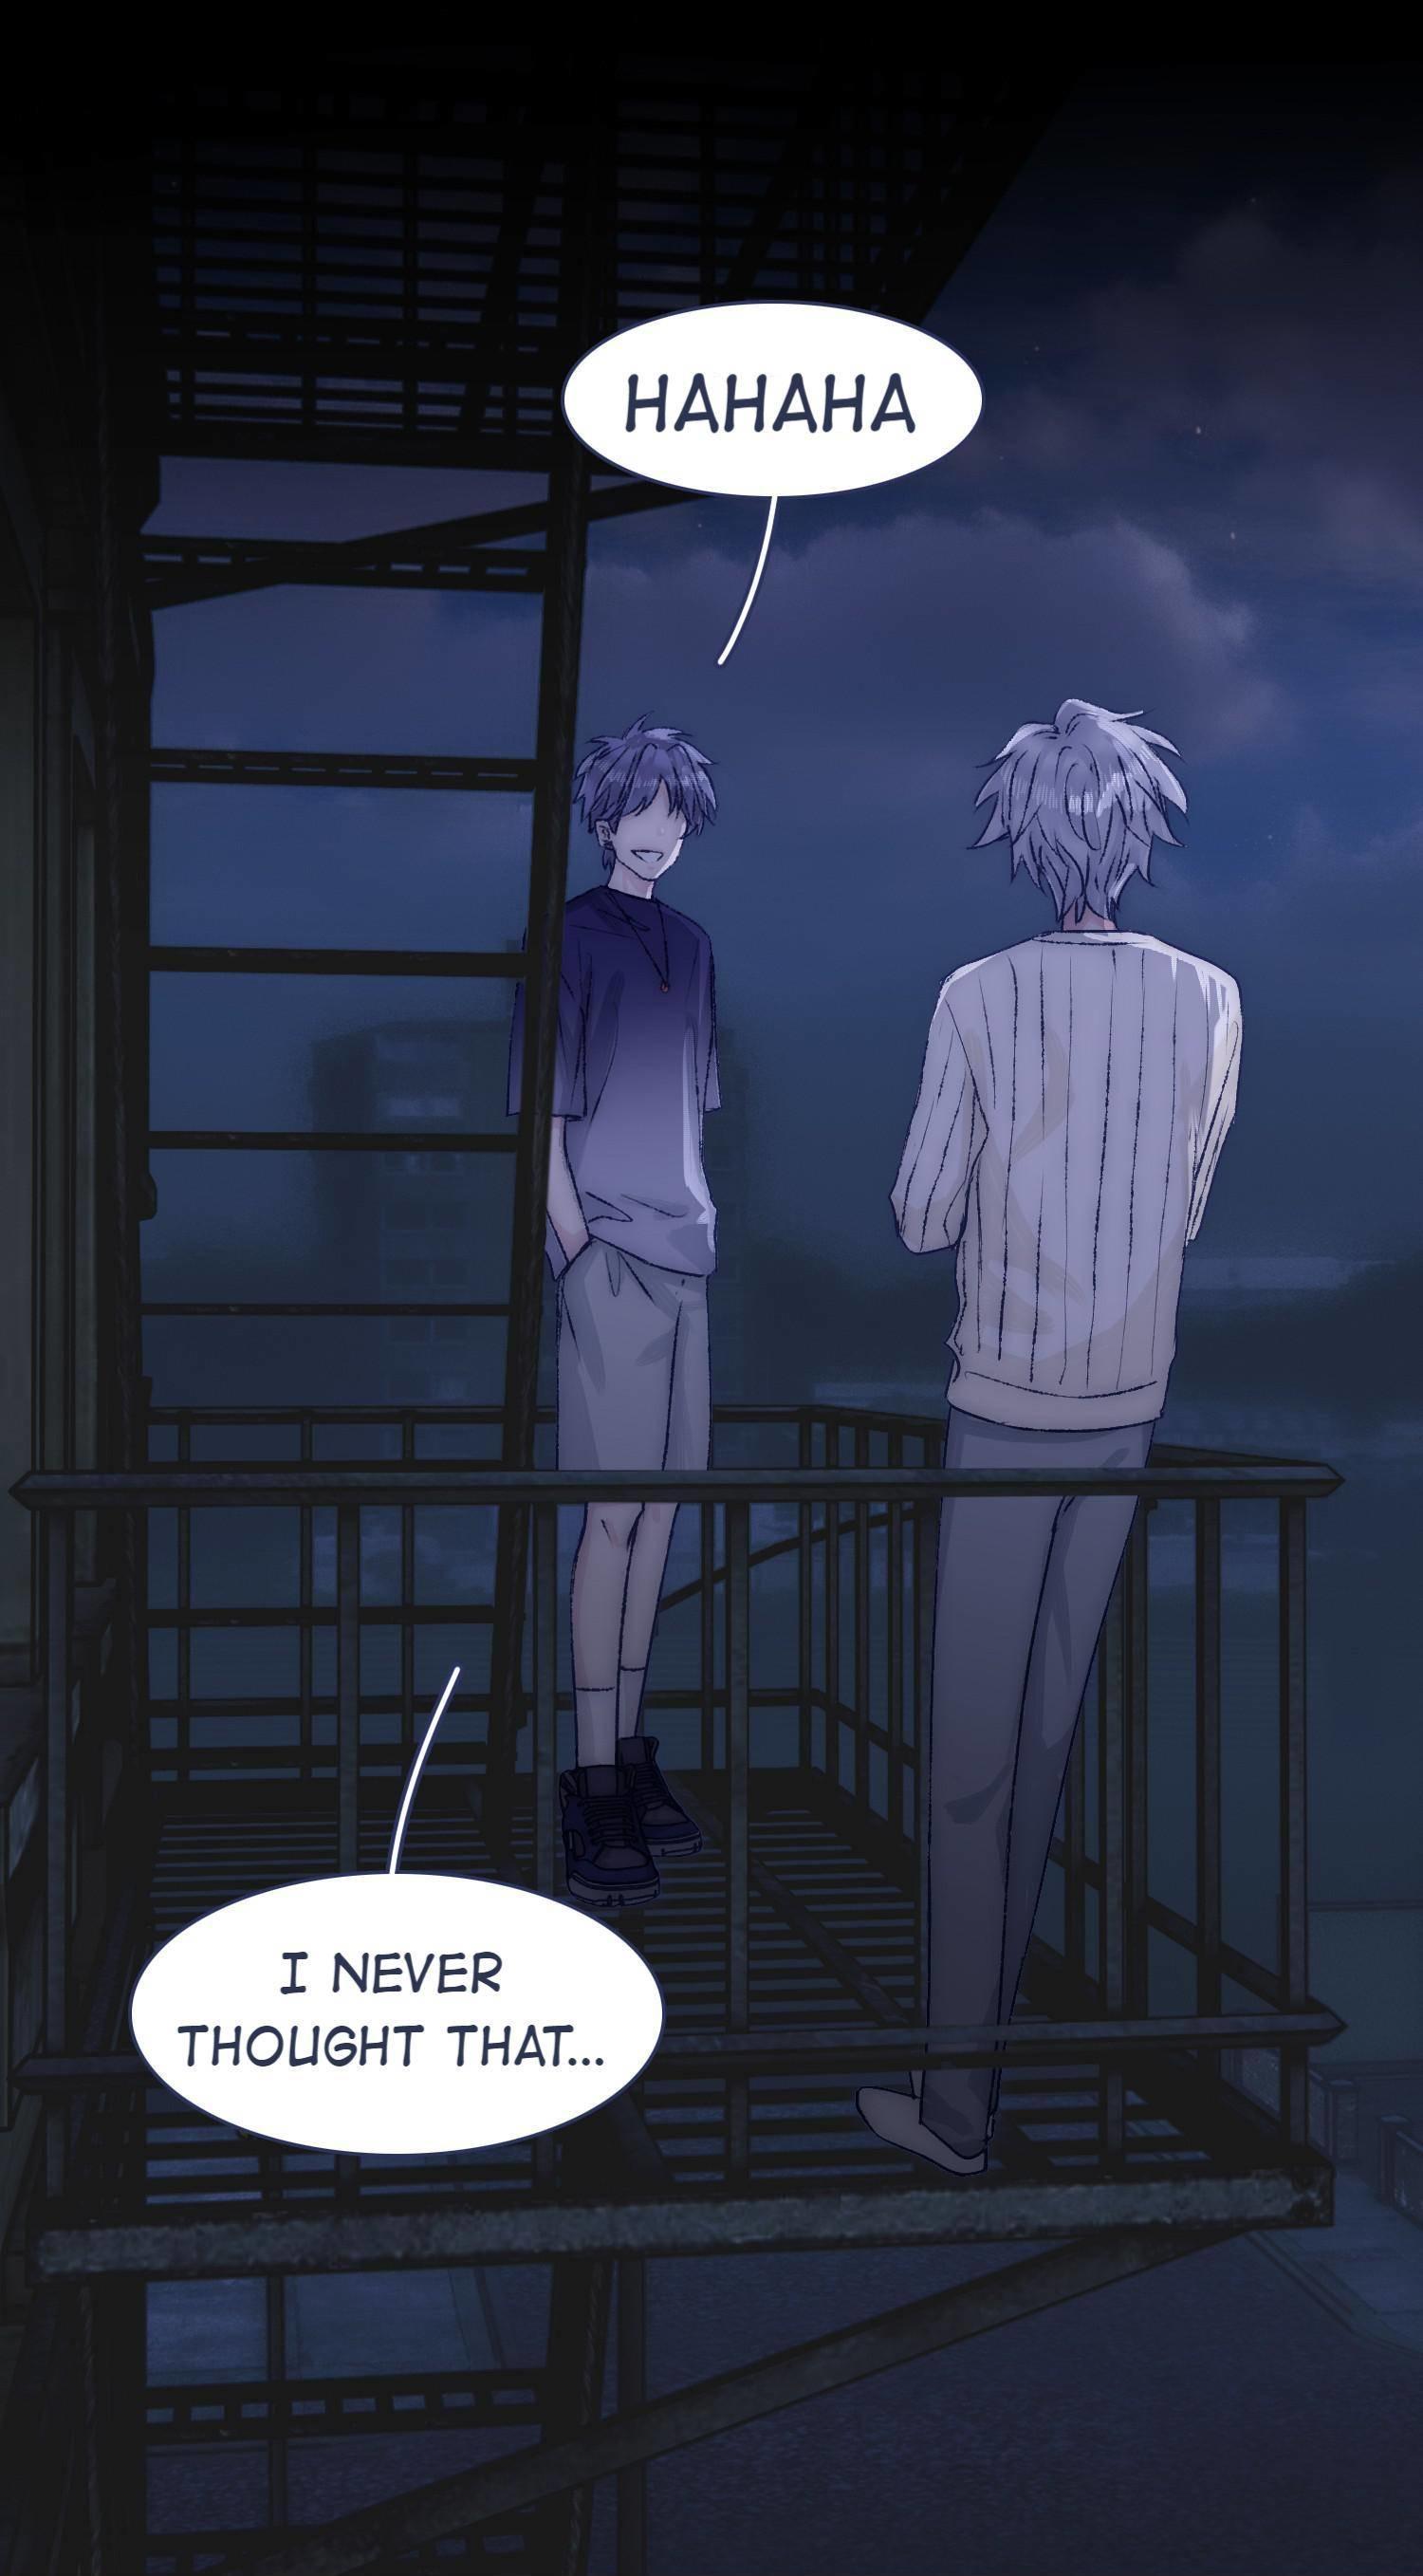 I Offer My Neck To You Chapter 72 page 22 - Mangakakalot